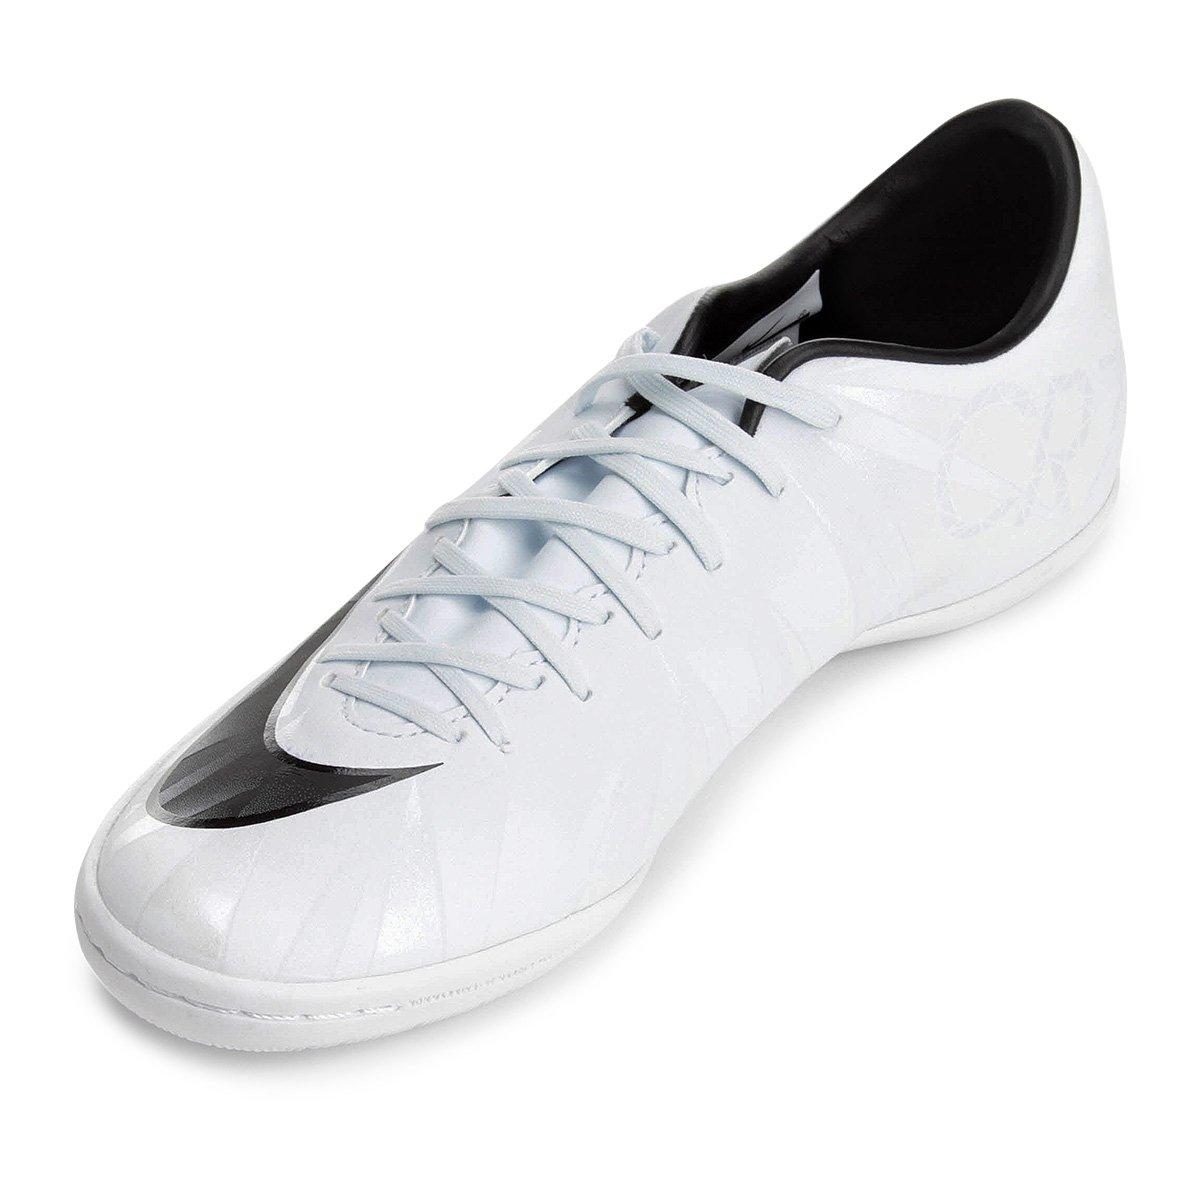 0ee63495fe Chuteira Futsal Nike Mercurial X Victory 6 CR7 IC - Compre Agora ...